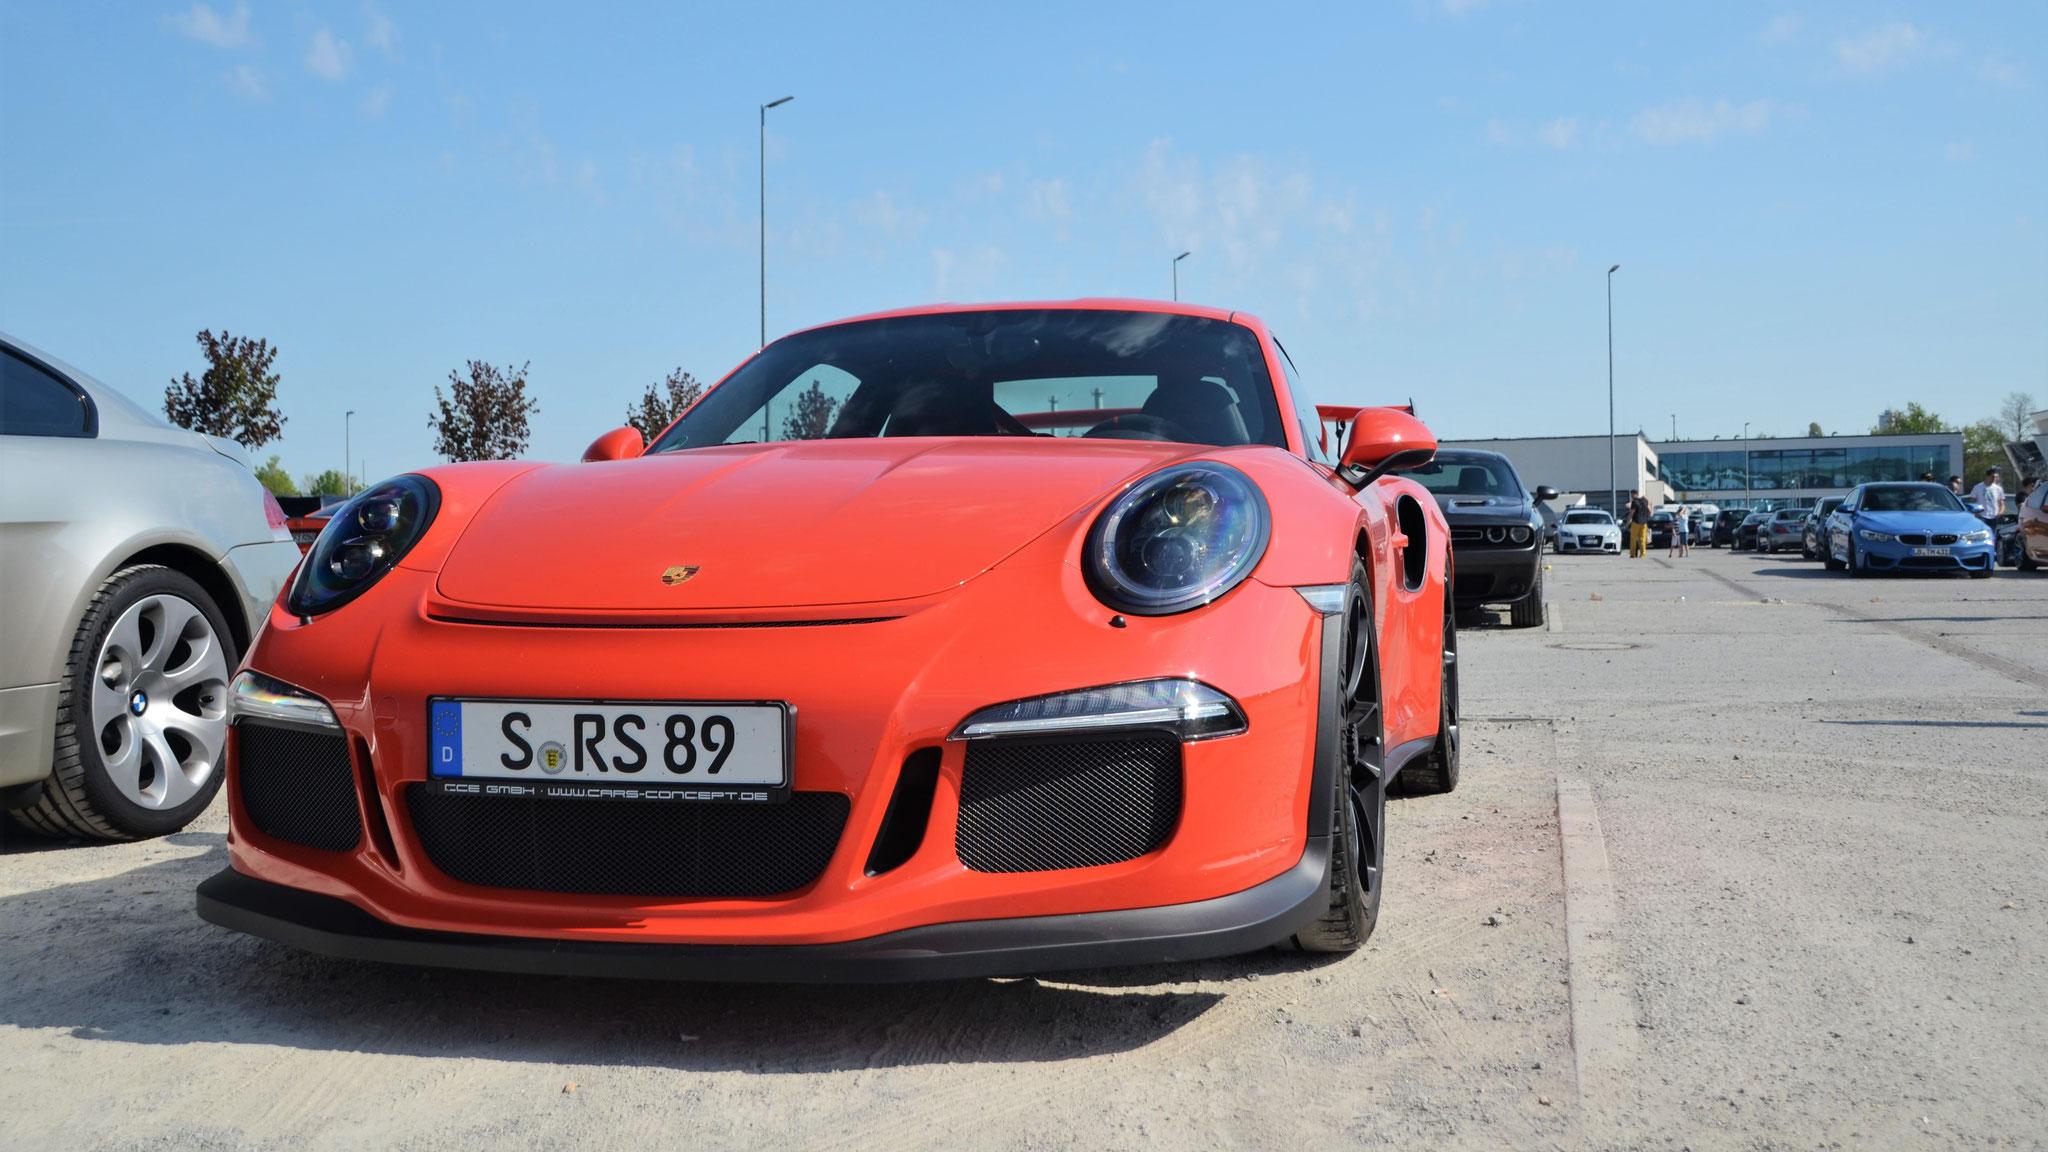 Porsche 911 GT3 RS - S-RS-89